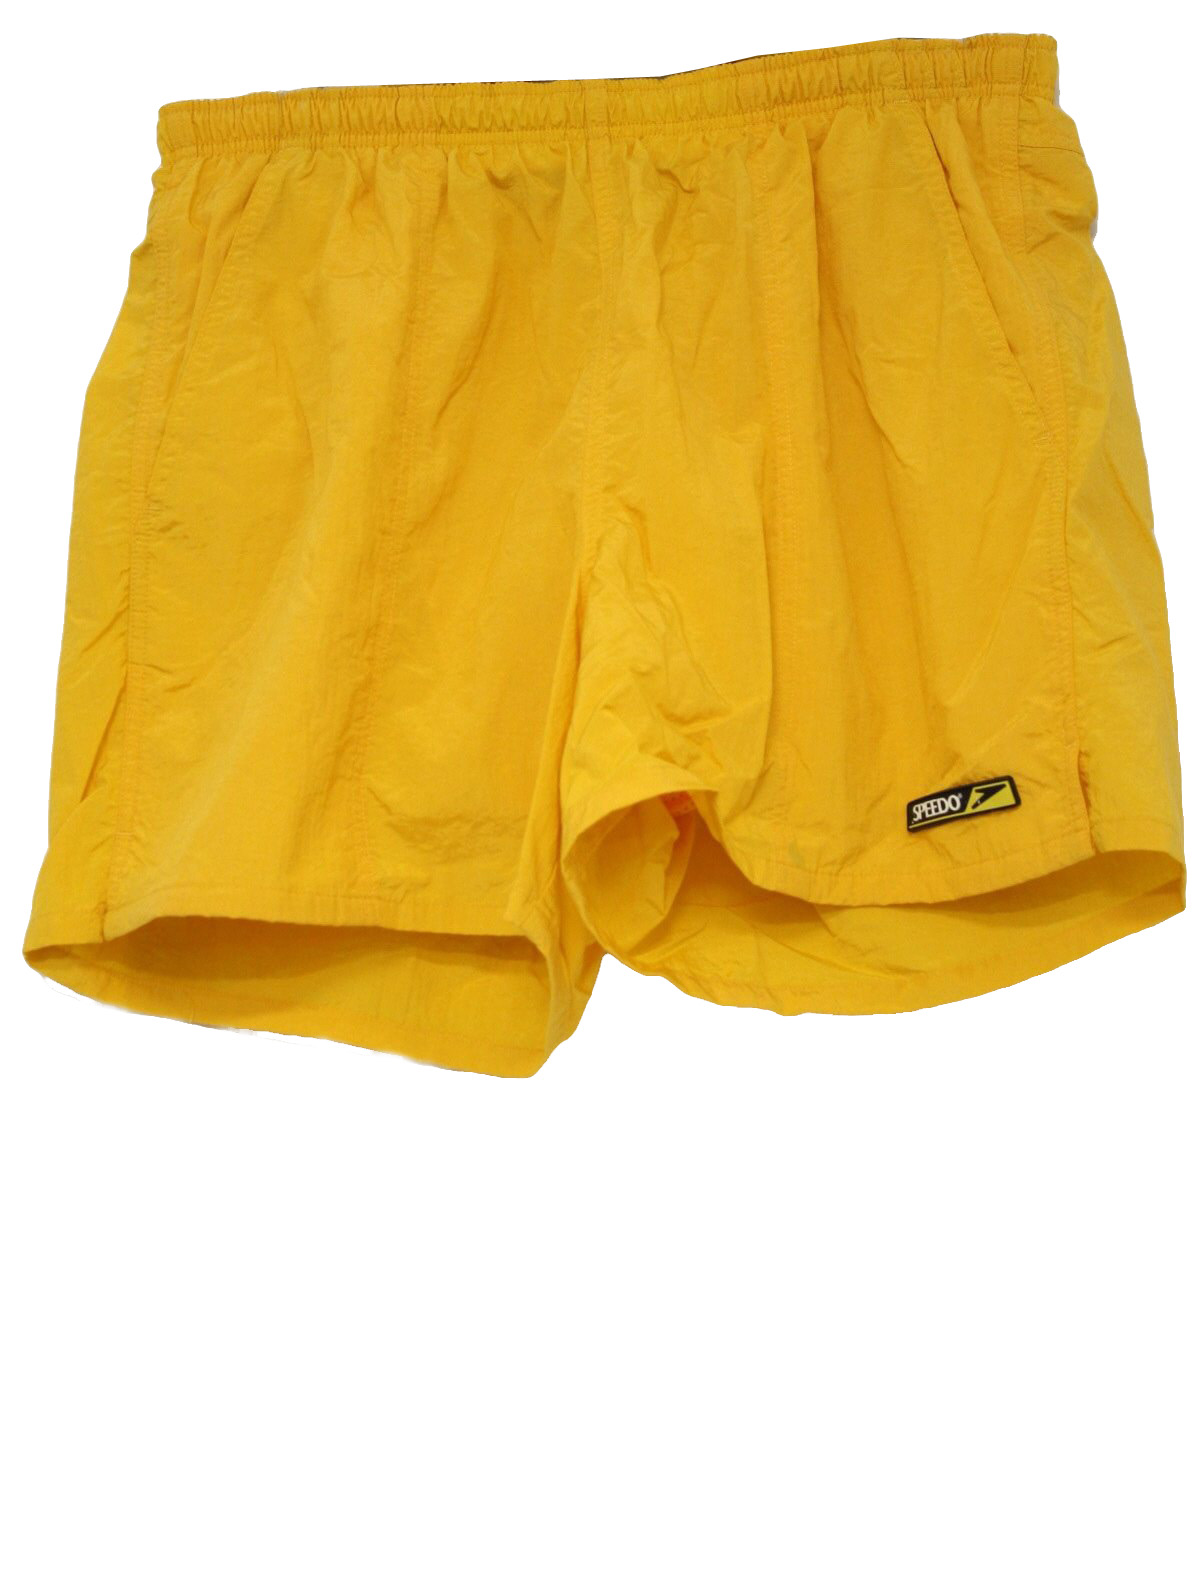 c8d4e142c3 Speedo Nineties Vintage Swimsuit/Swimwear: 90s -Speedo- Mens bright ...